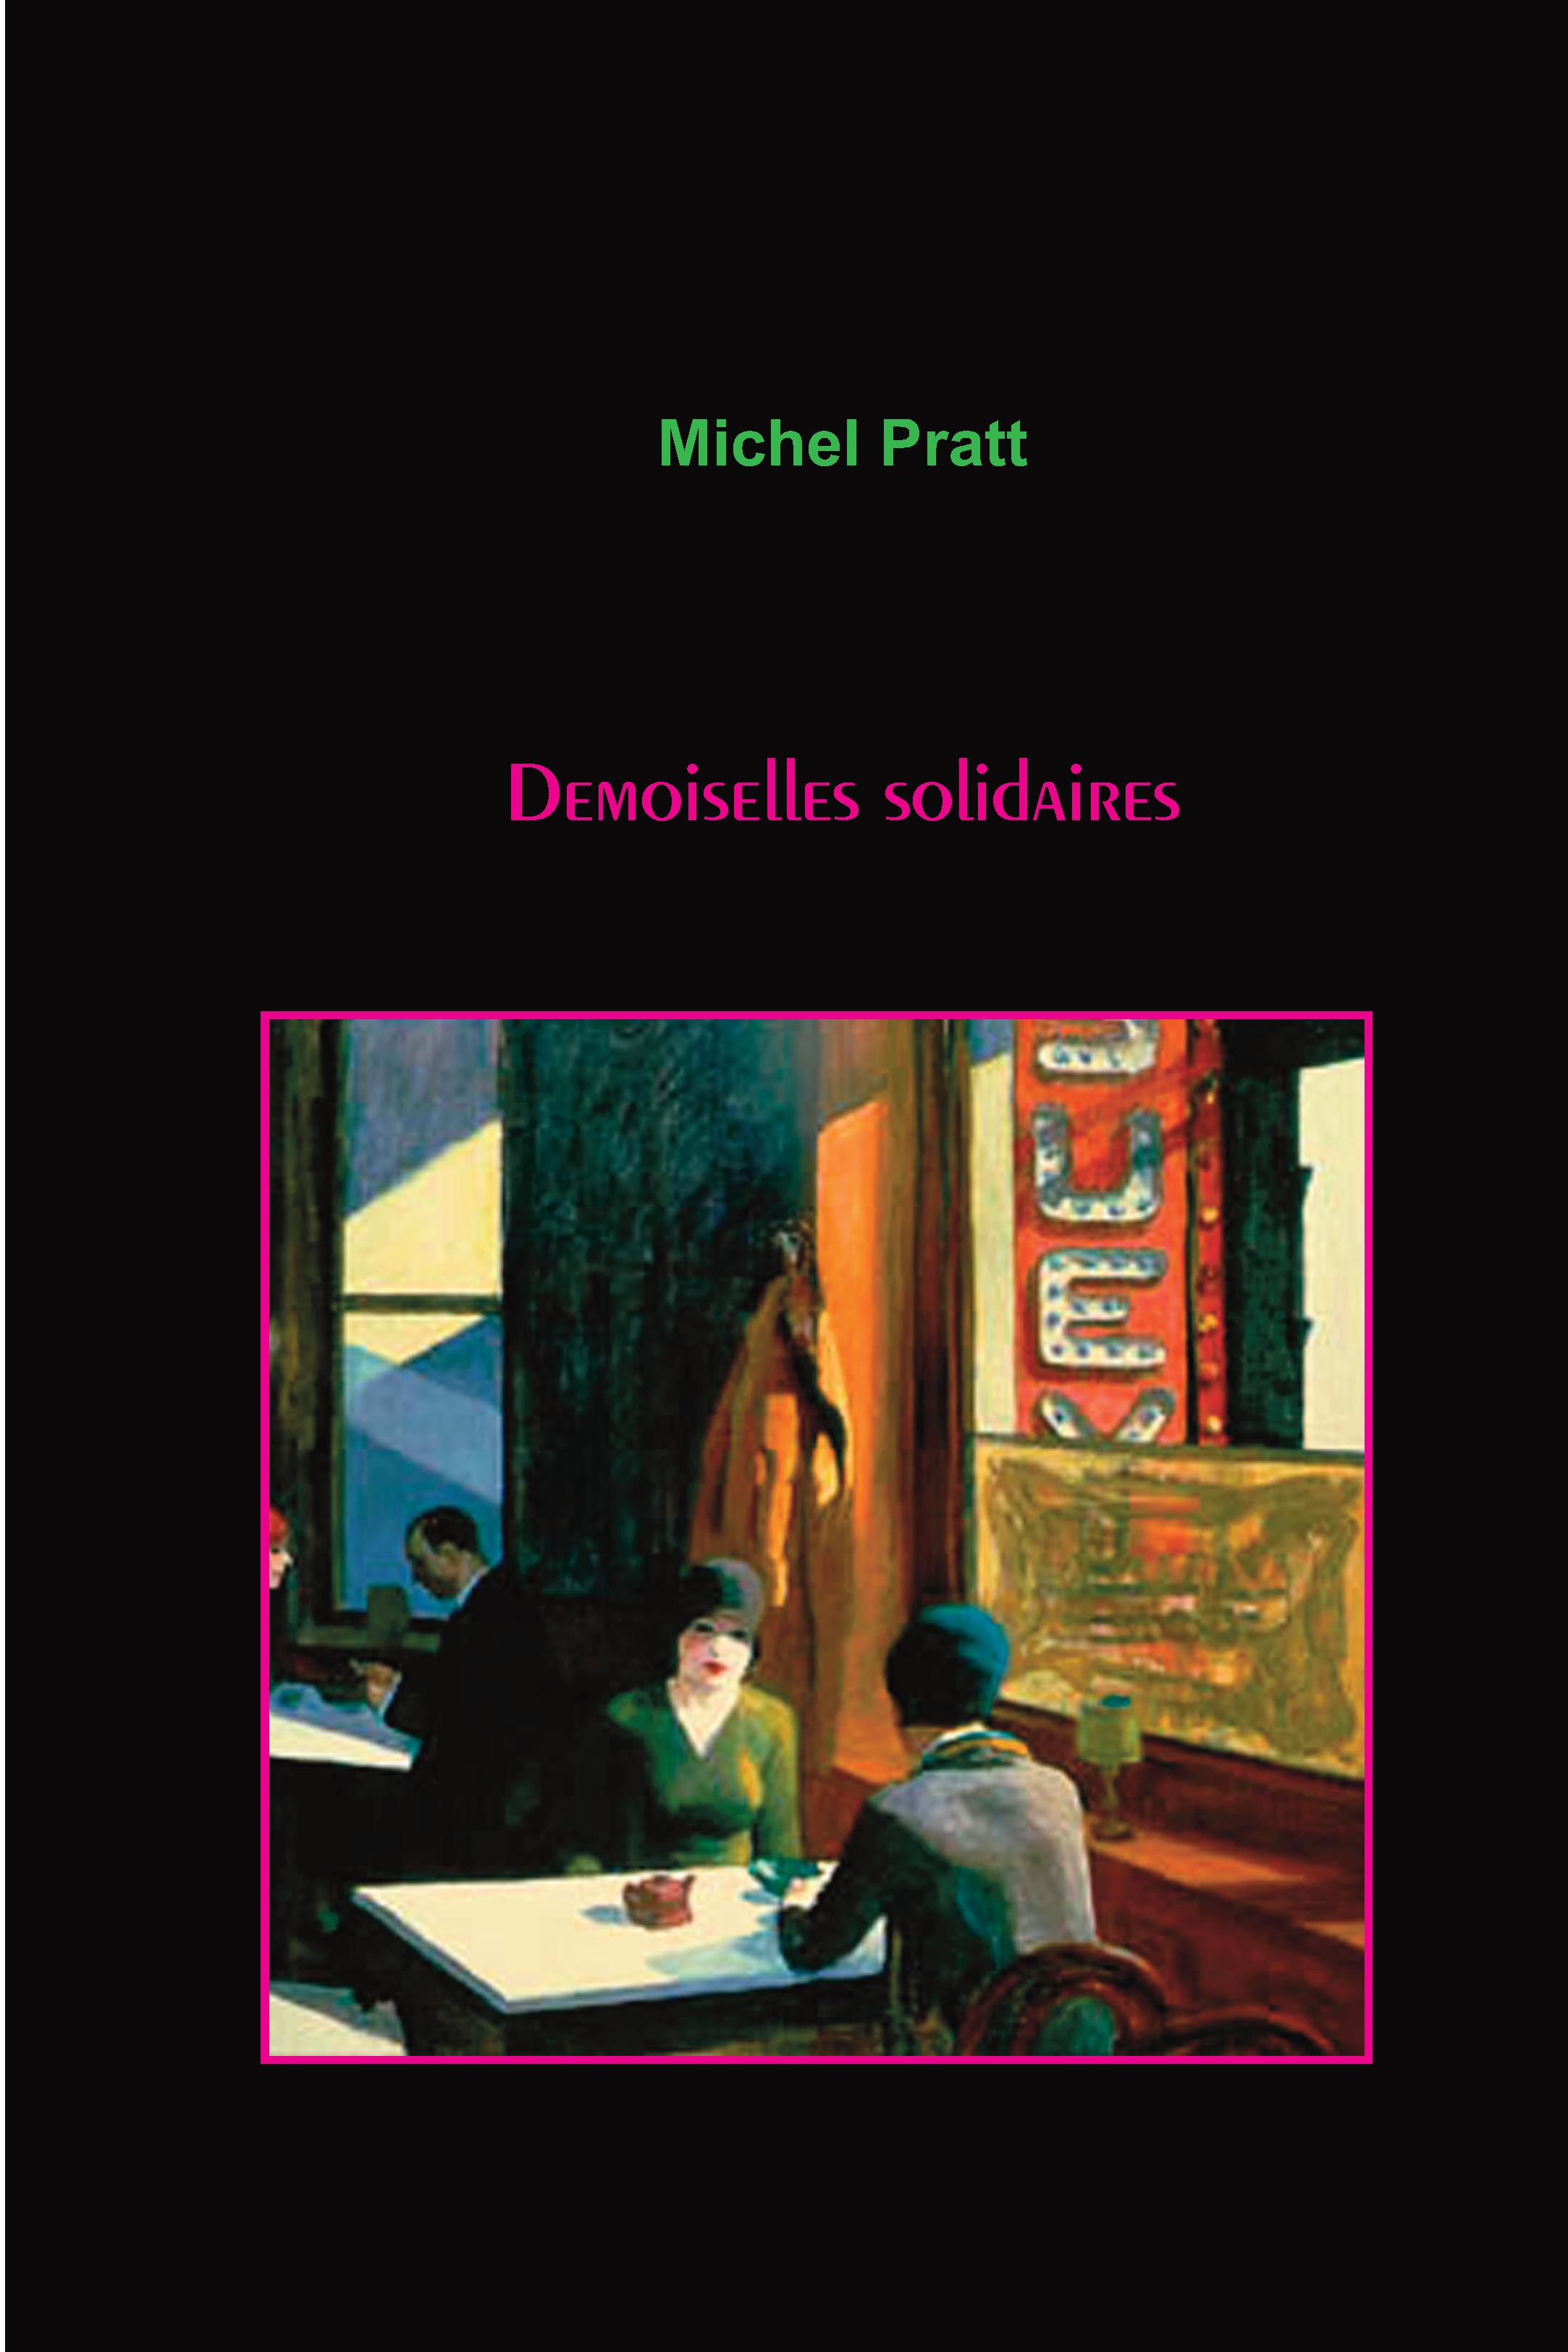 Demoiselles solidaires - Michel Pratt